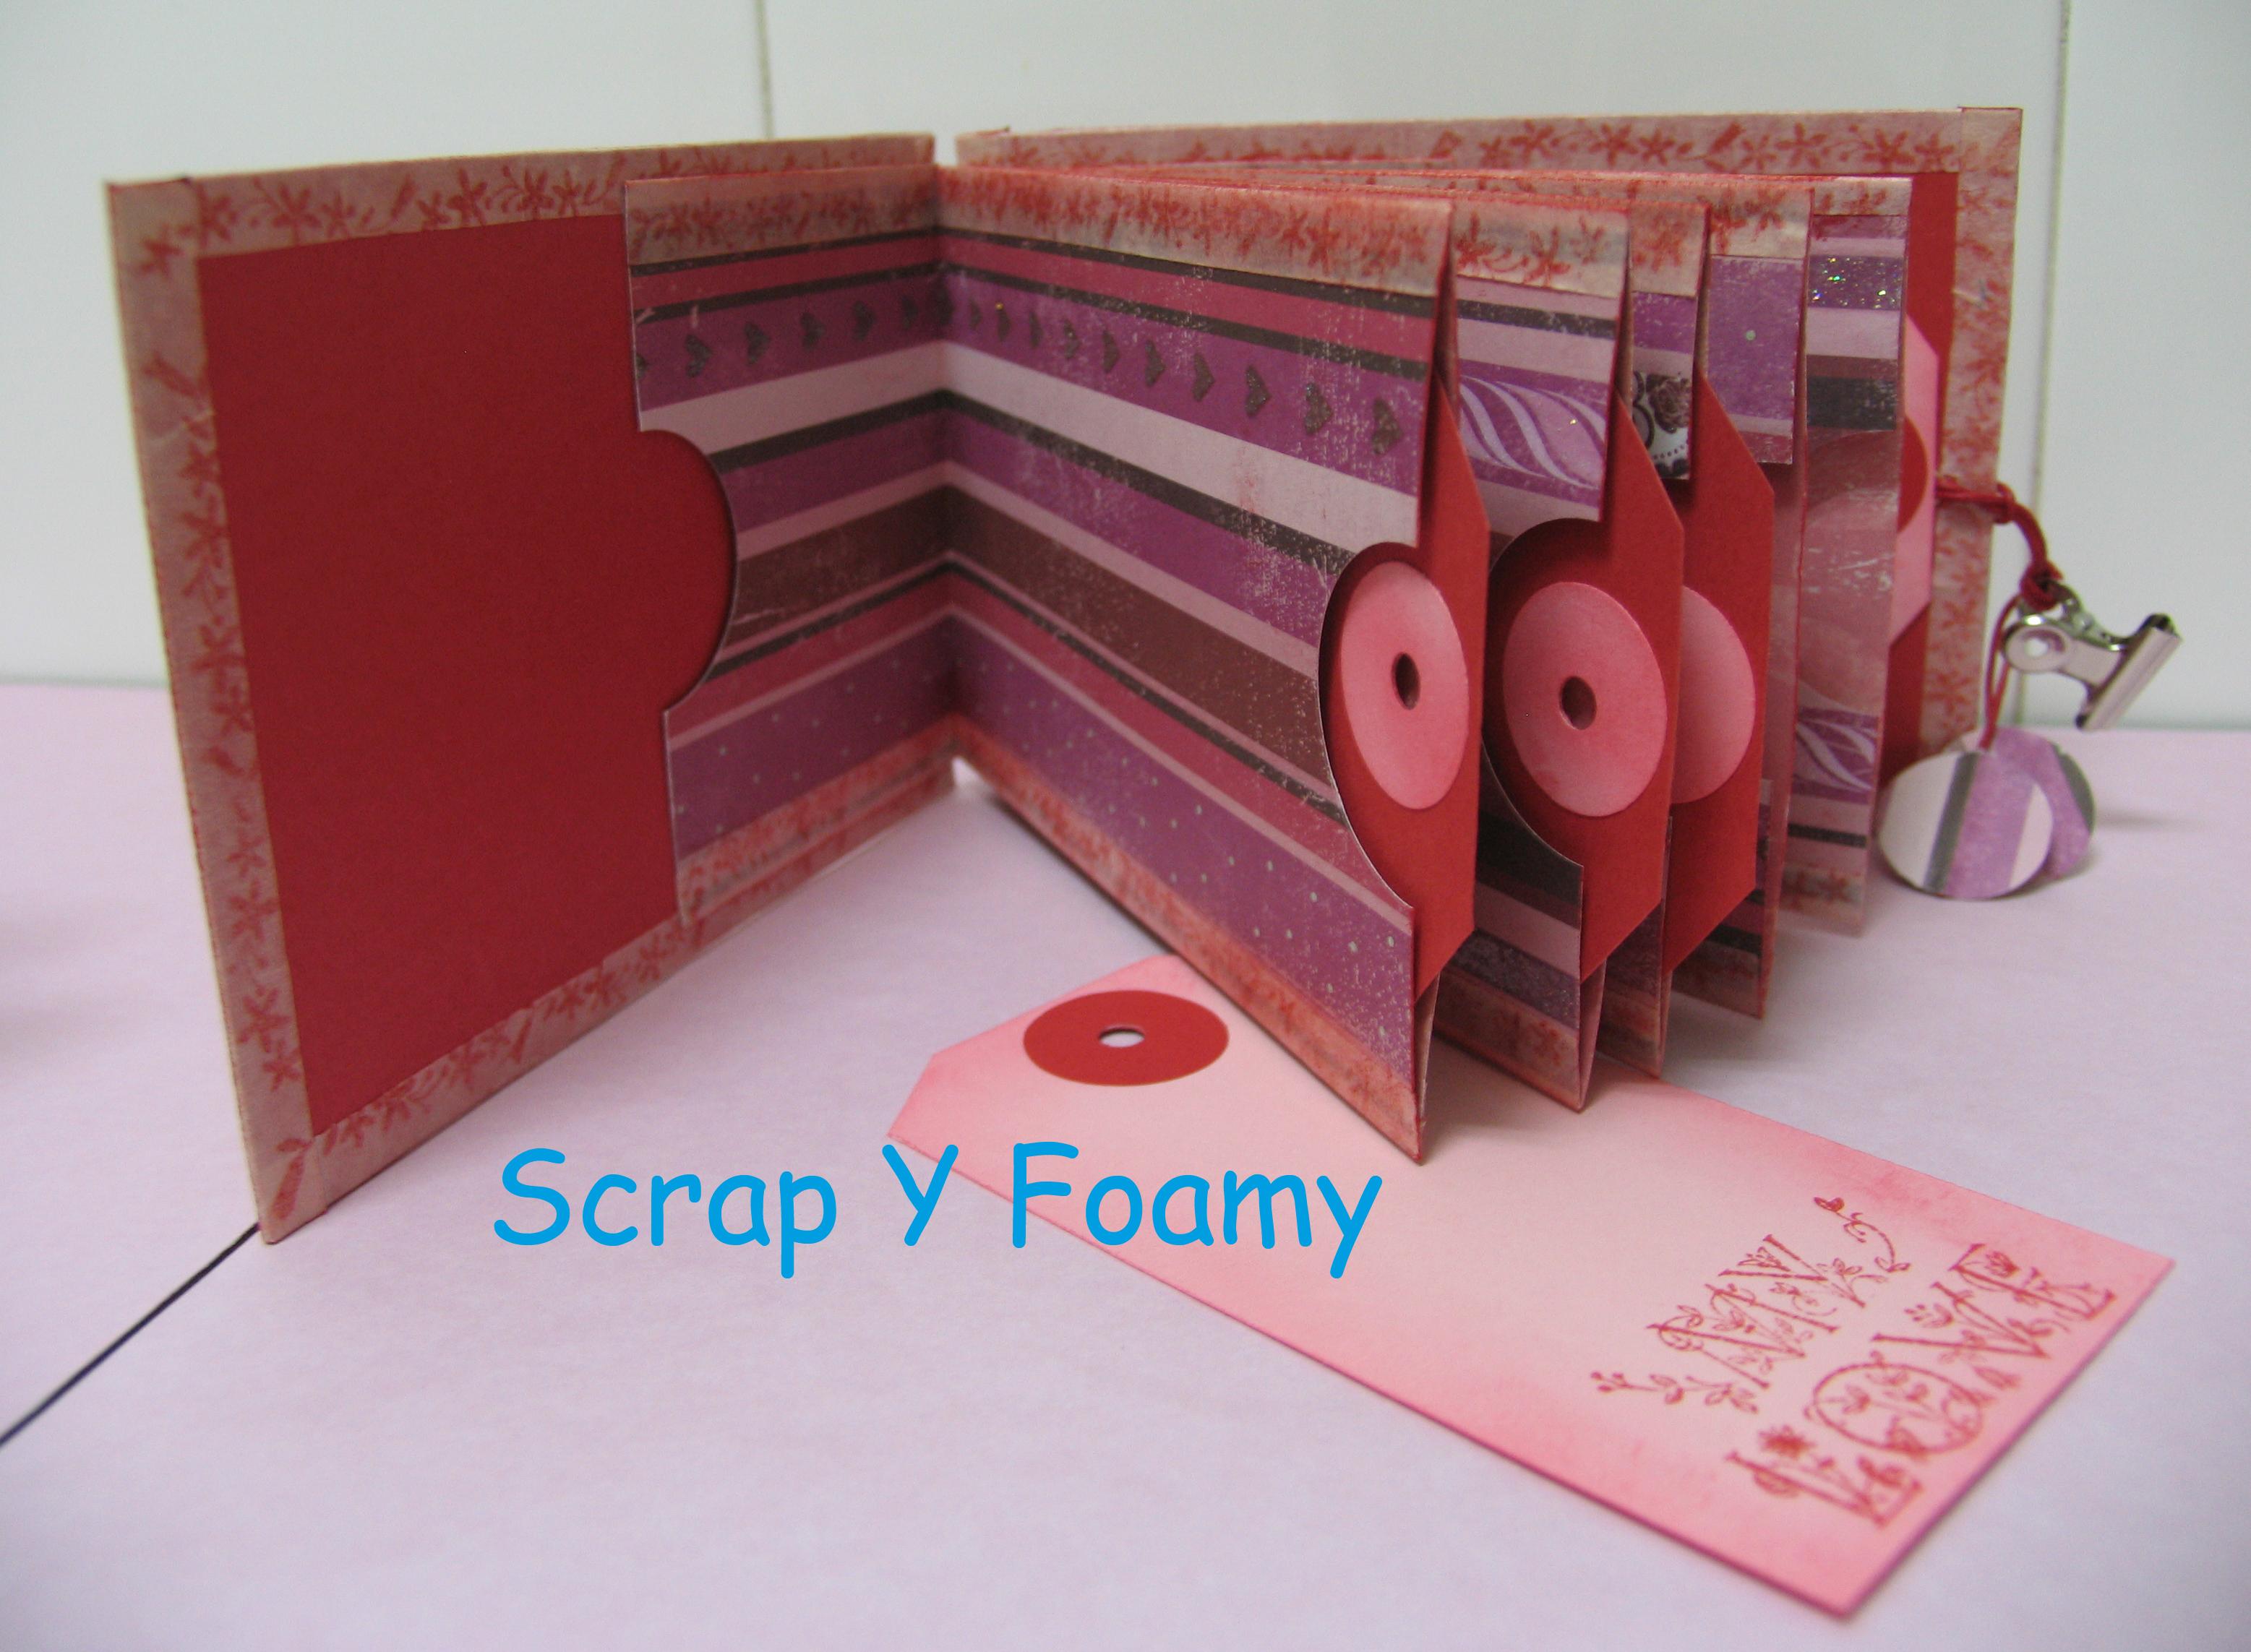 taller mini 7 tags para san valent n scrap y foamy rh scrapyfoamy wordpress  com Manualidades